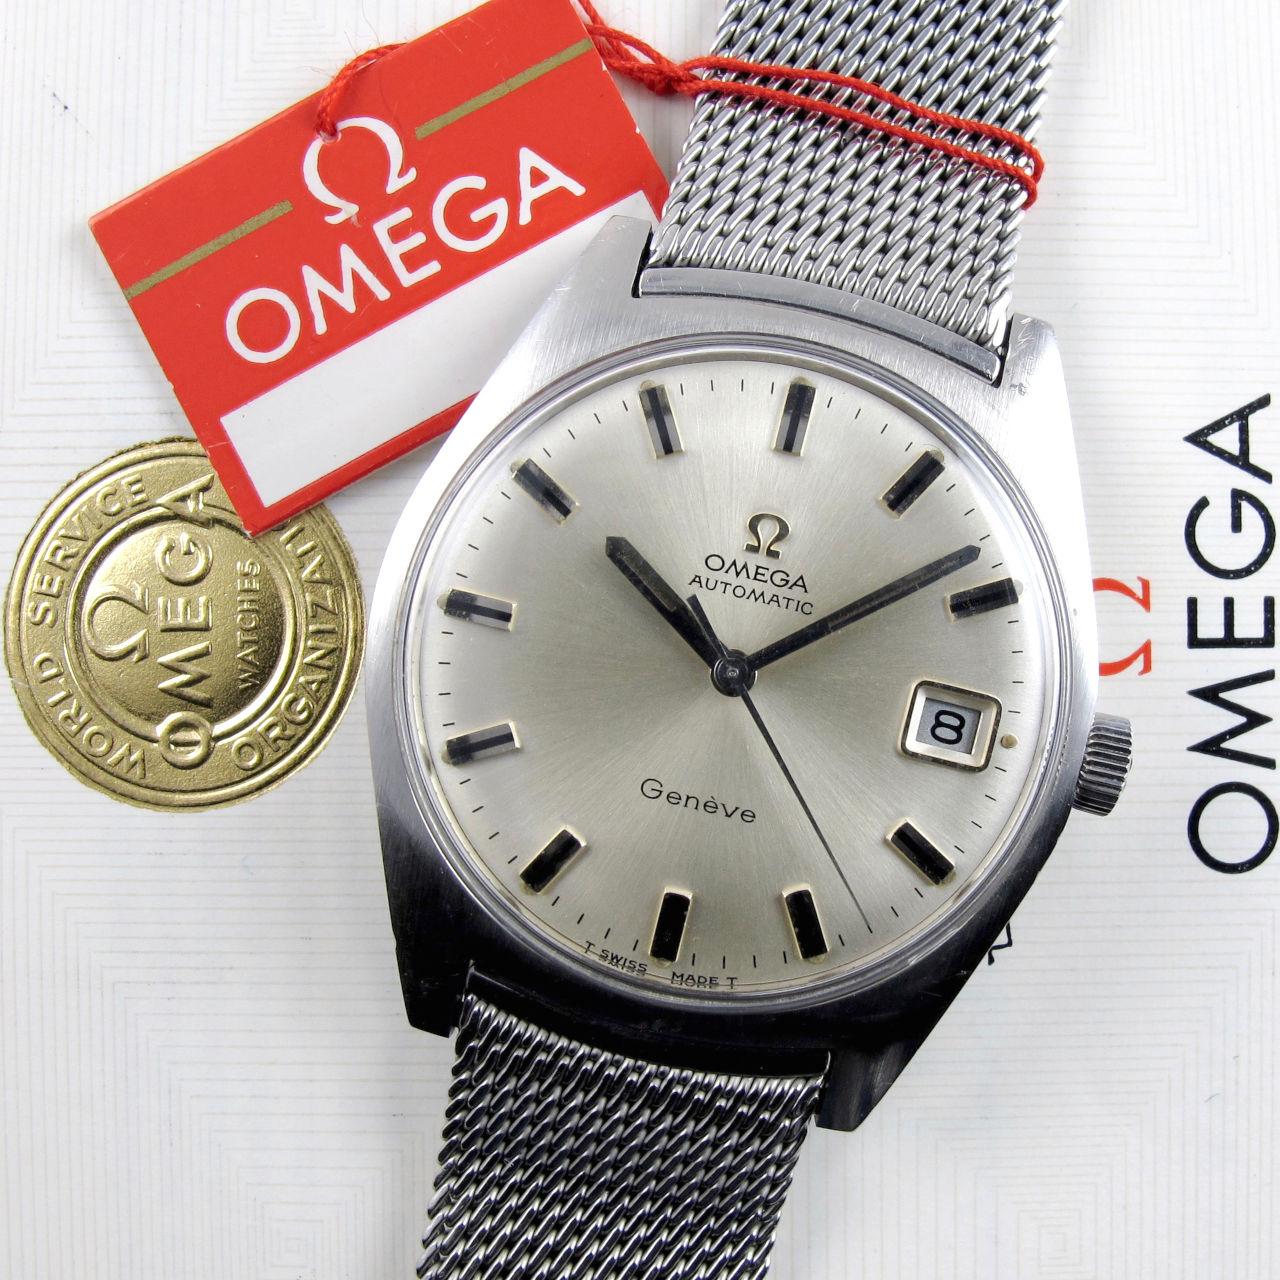 Omega Genève Ref. 166.041 steel vintage wristwatch, sold in 1969